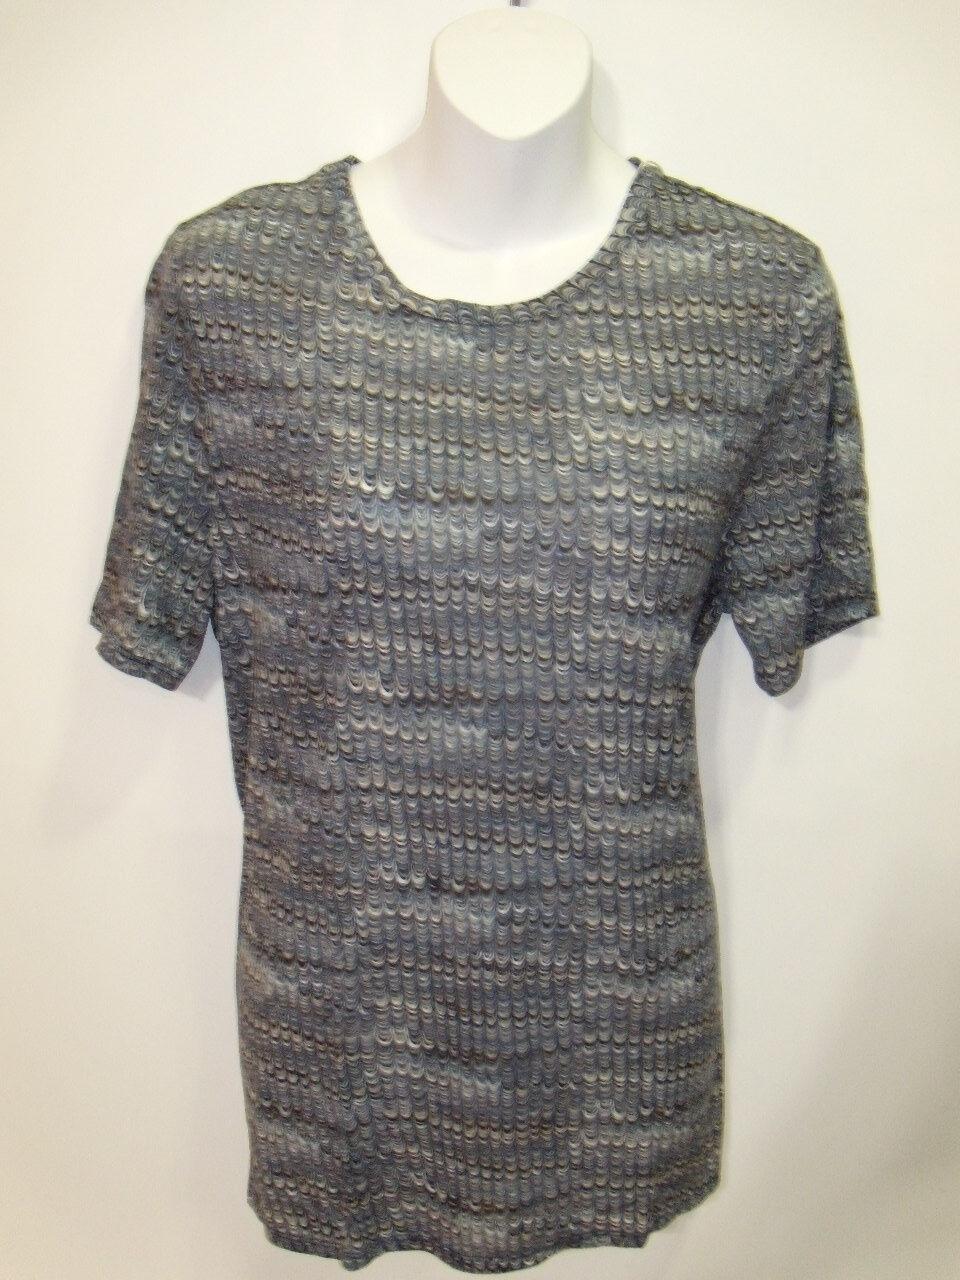 NWT Tory Burch Marble Printed Cotton Crewneck Tee Shirt Medium NEW Top